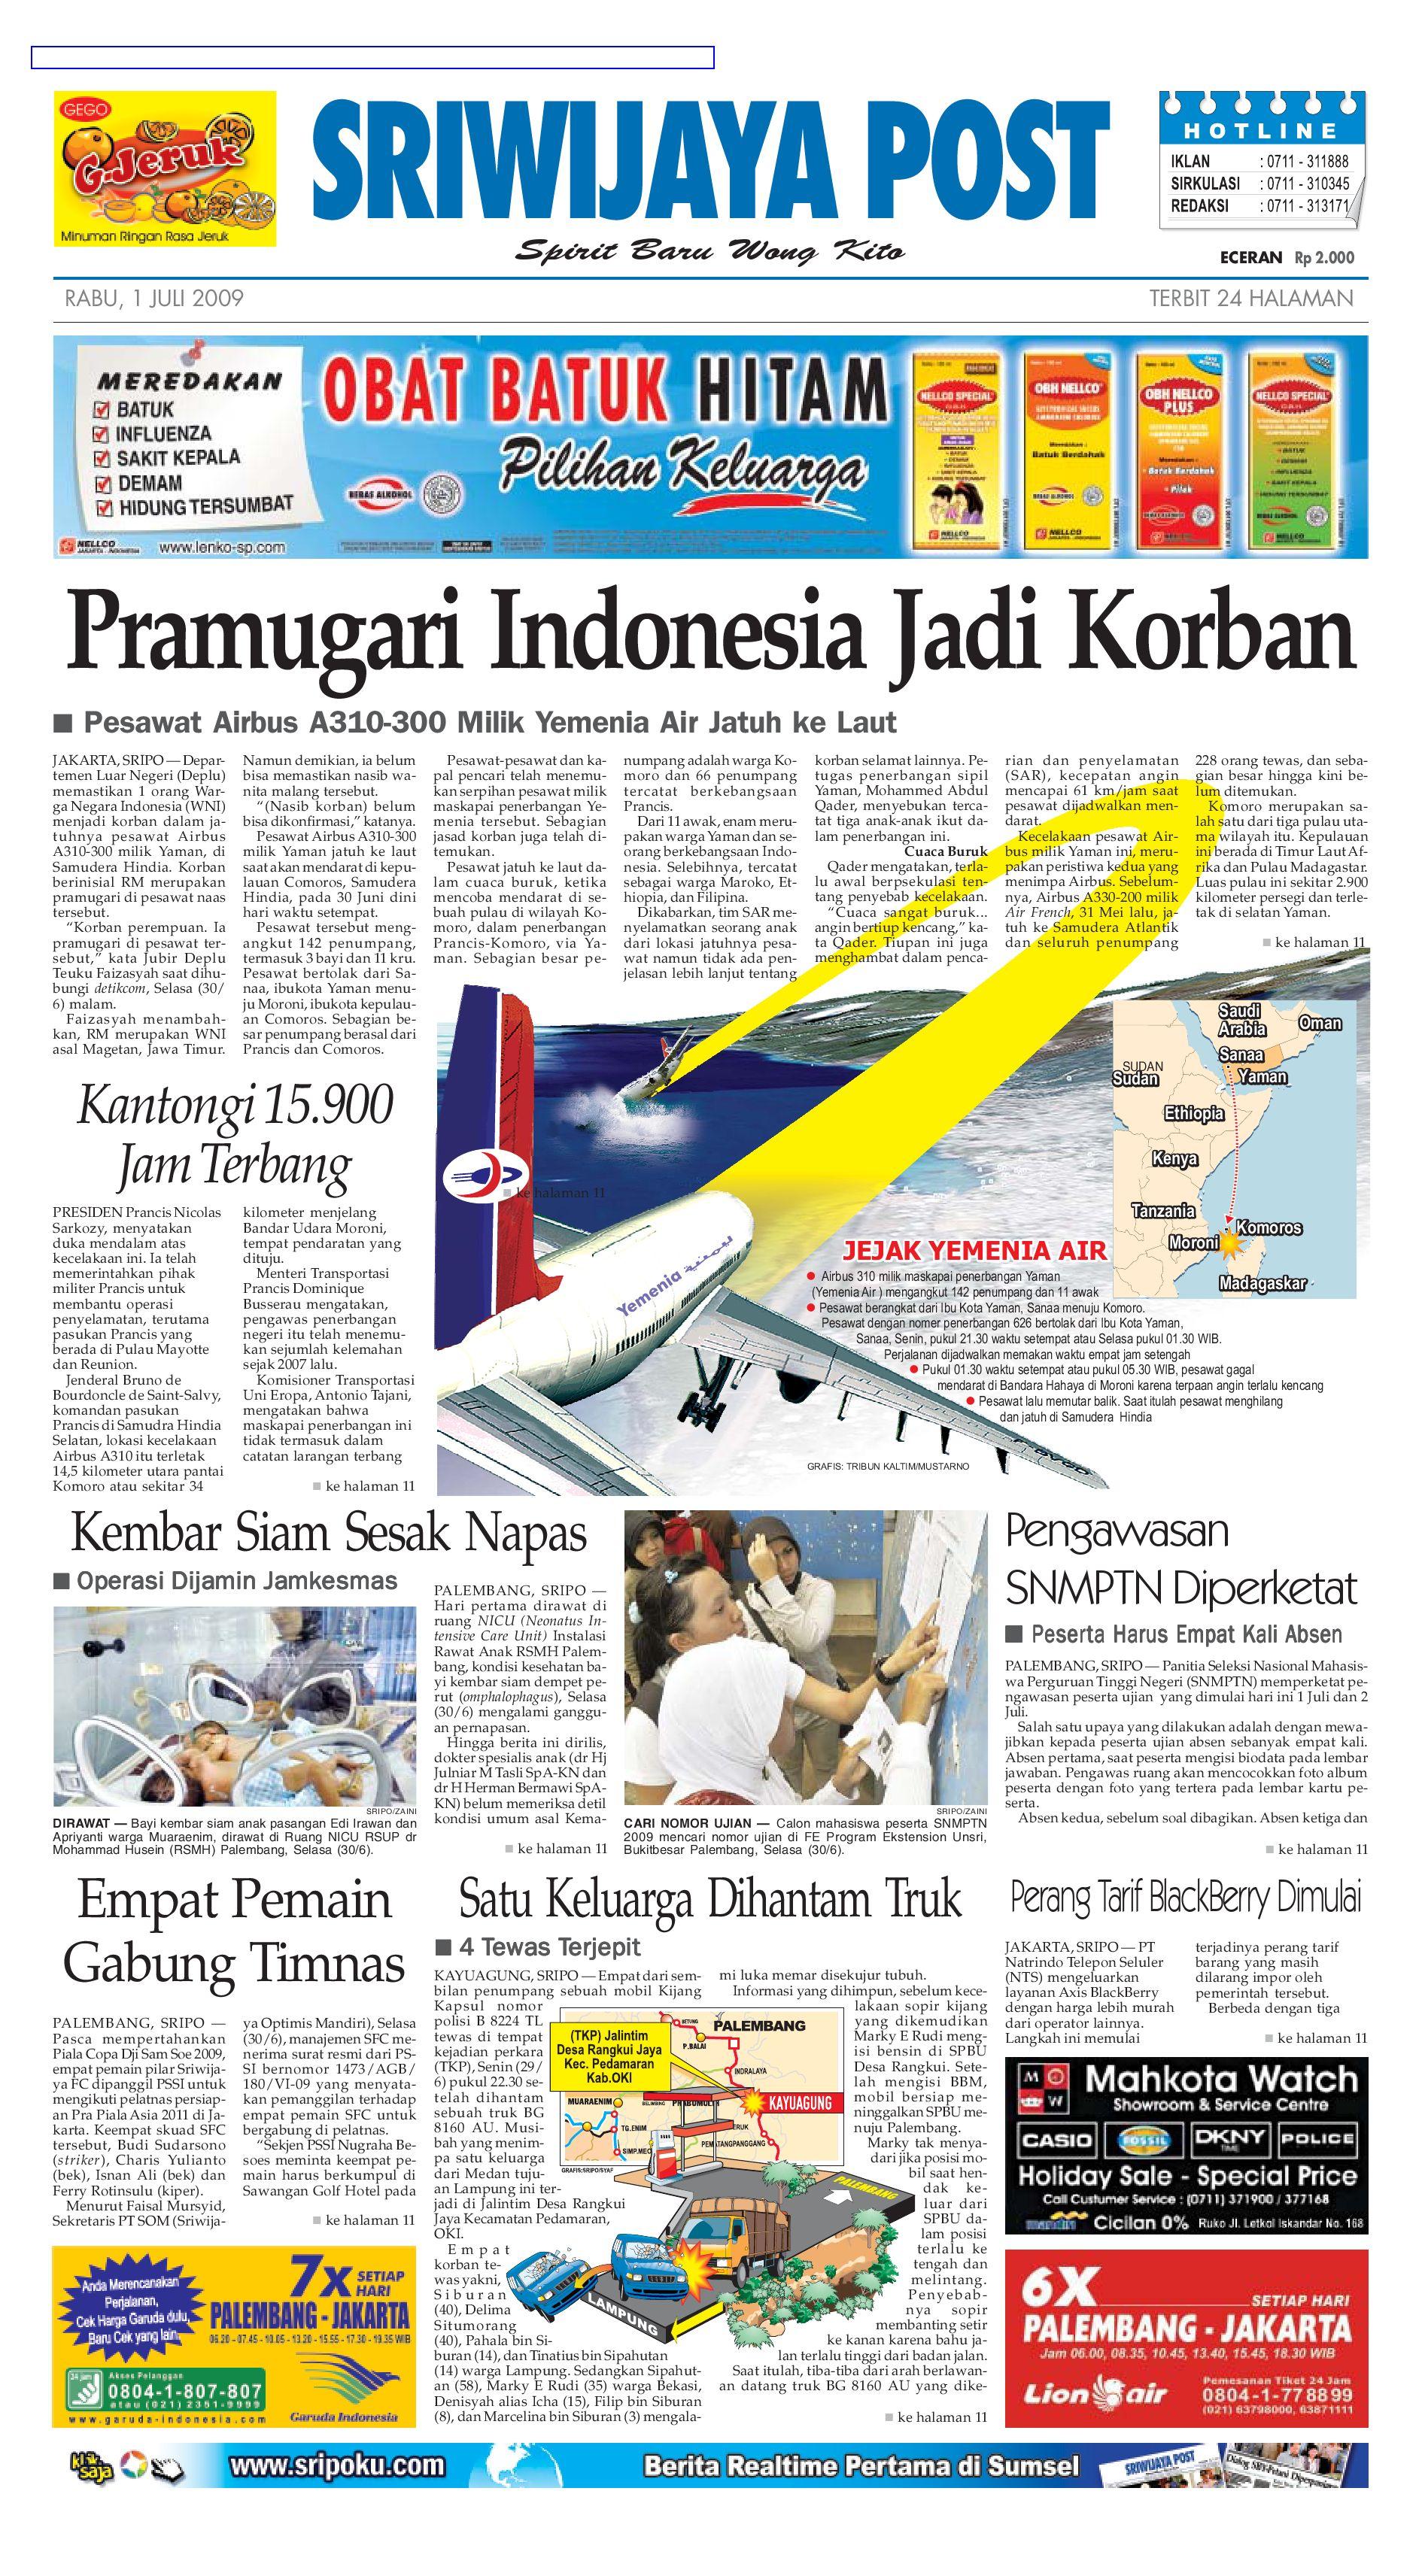 Sriwijaya Post Edisi Rabu 01 Juli 2009 By Yulius Saputra Issuu Nature Pecinta Voucher Hypermart 50000 Alam